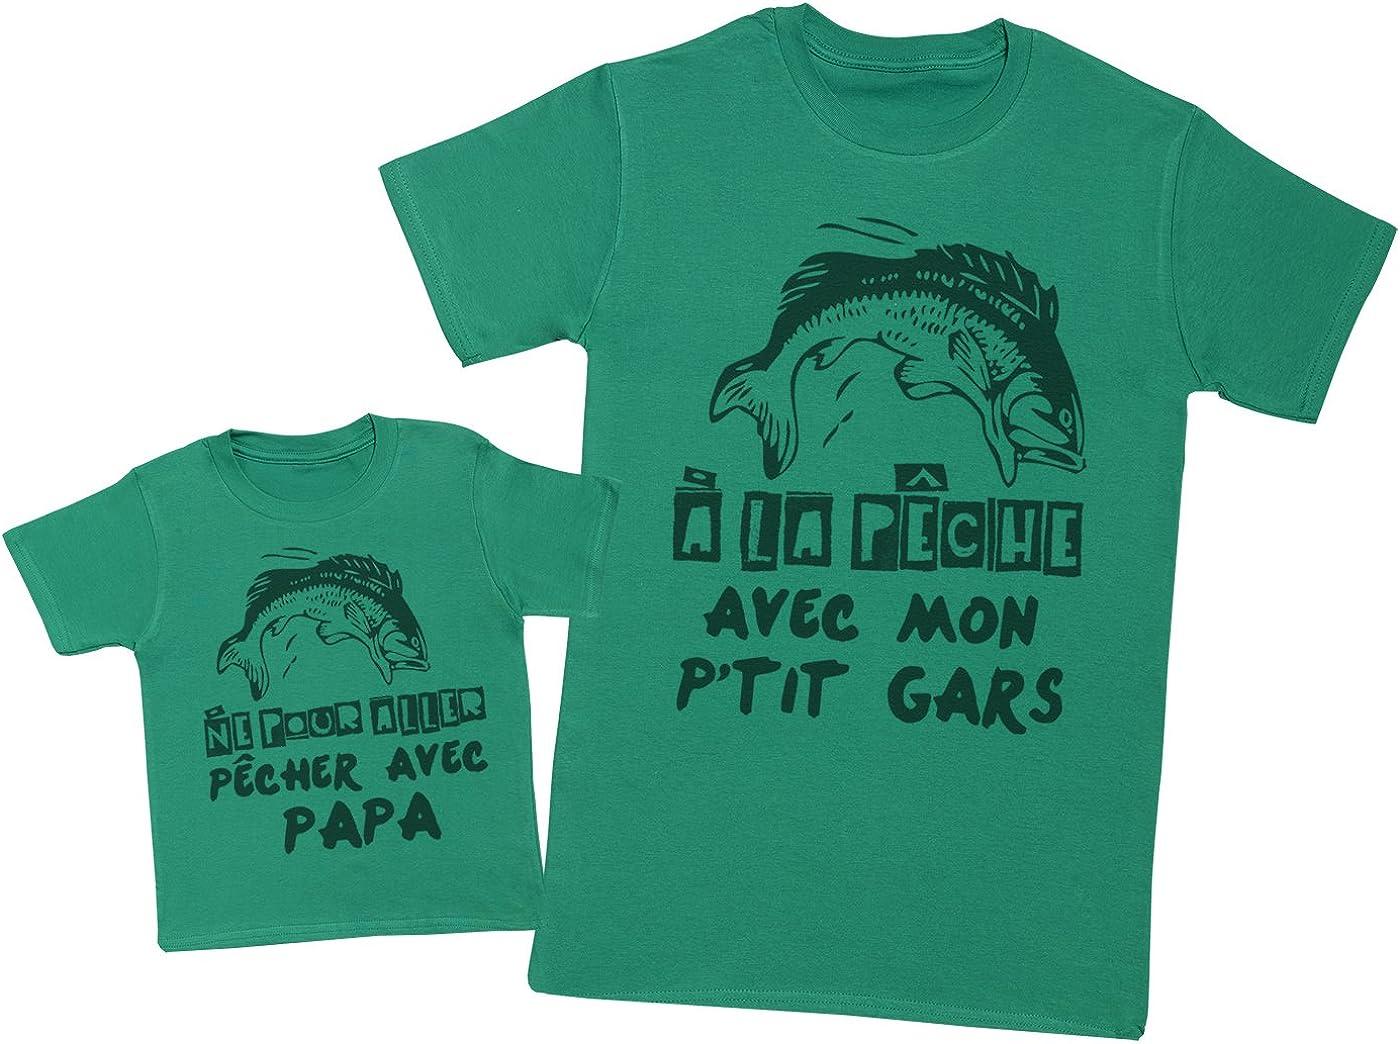 Hommes T-Shirt /& T-Shirt b/éb/é Zarlivia Clothing Mon Papa a Le Gar/çon Le Plus g/énial au Monde! Ensemble P/ère B/éb/é Cadeau